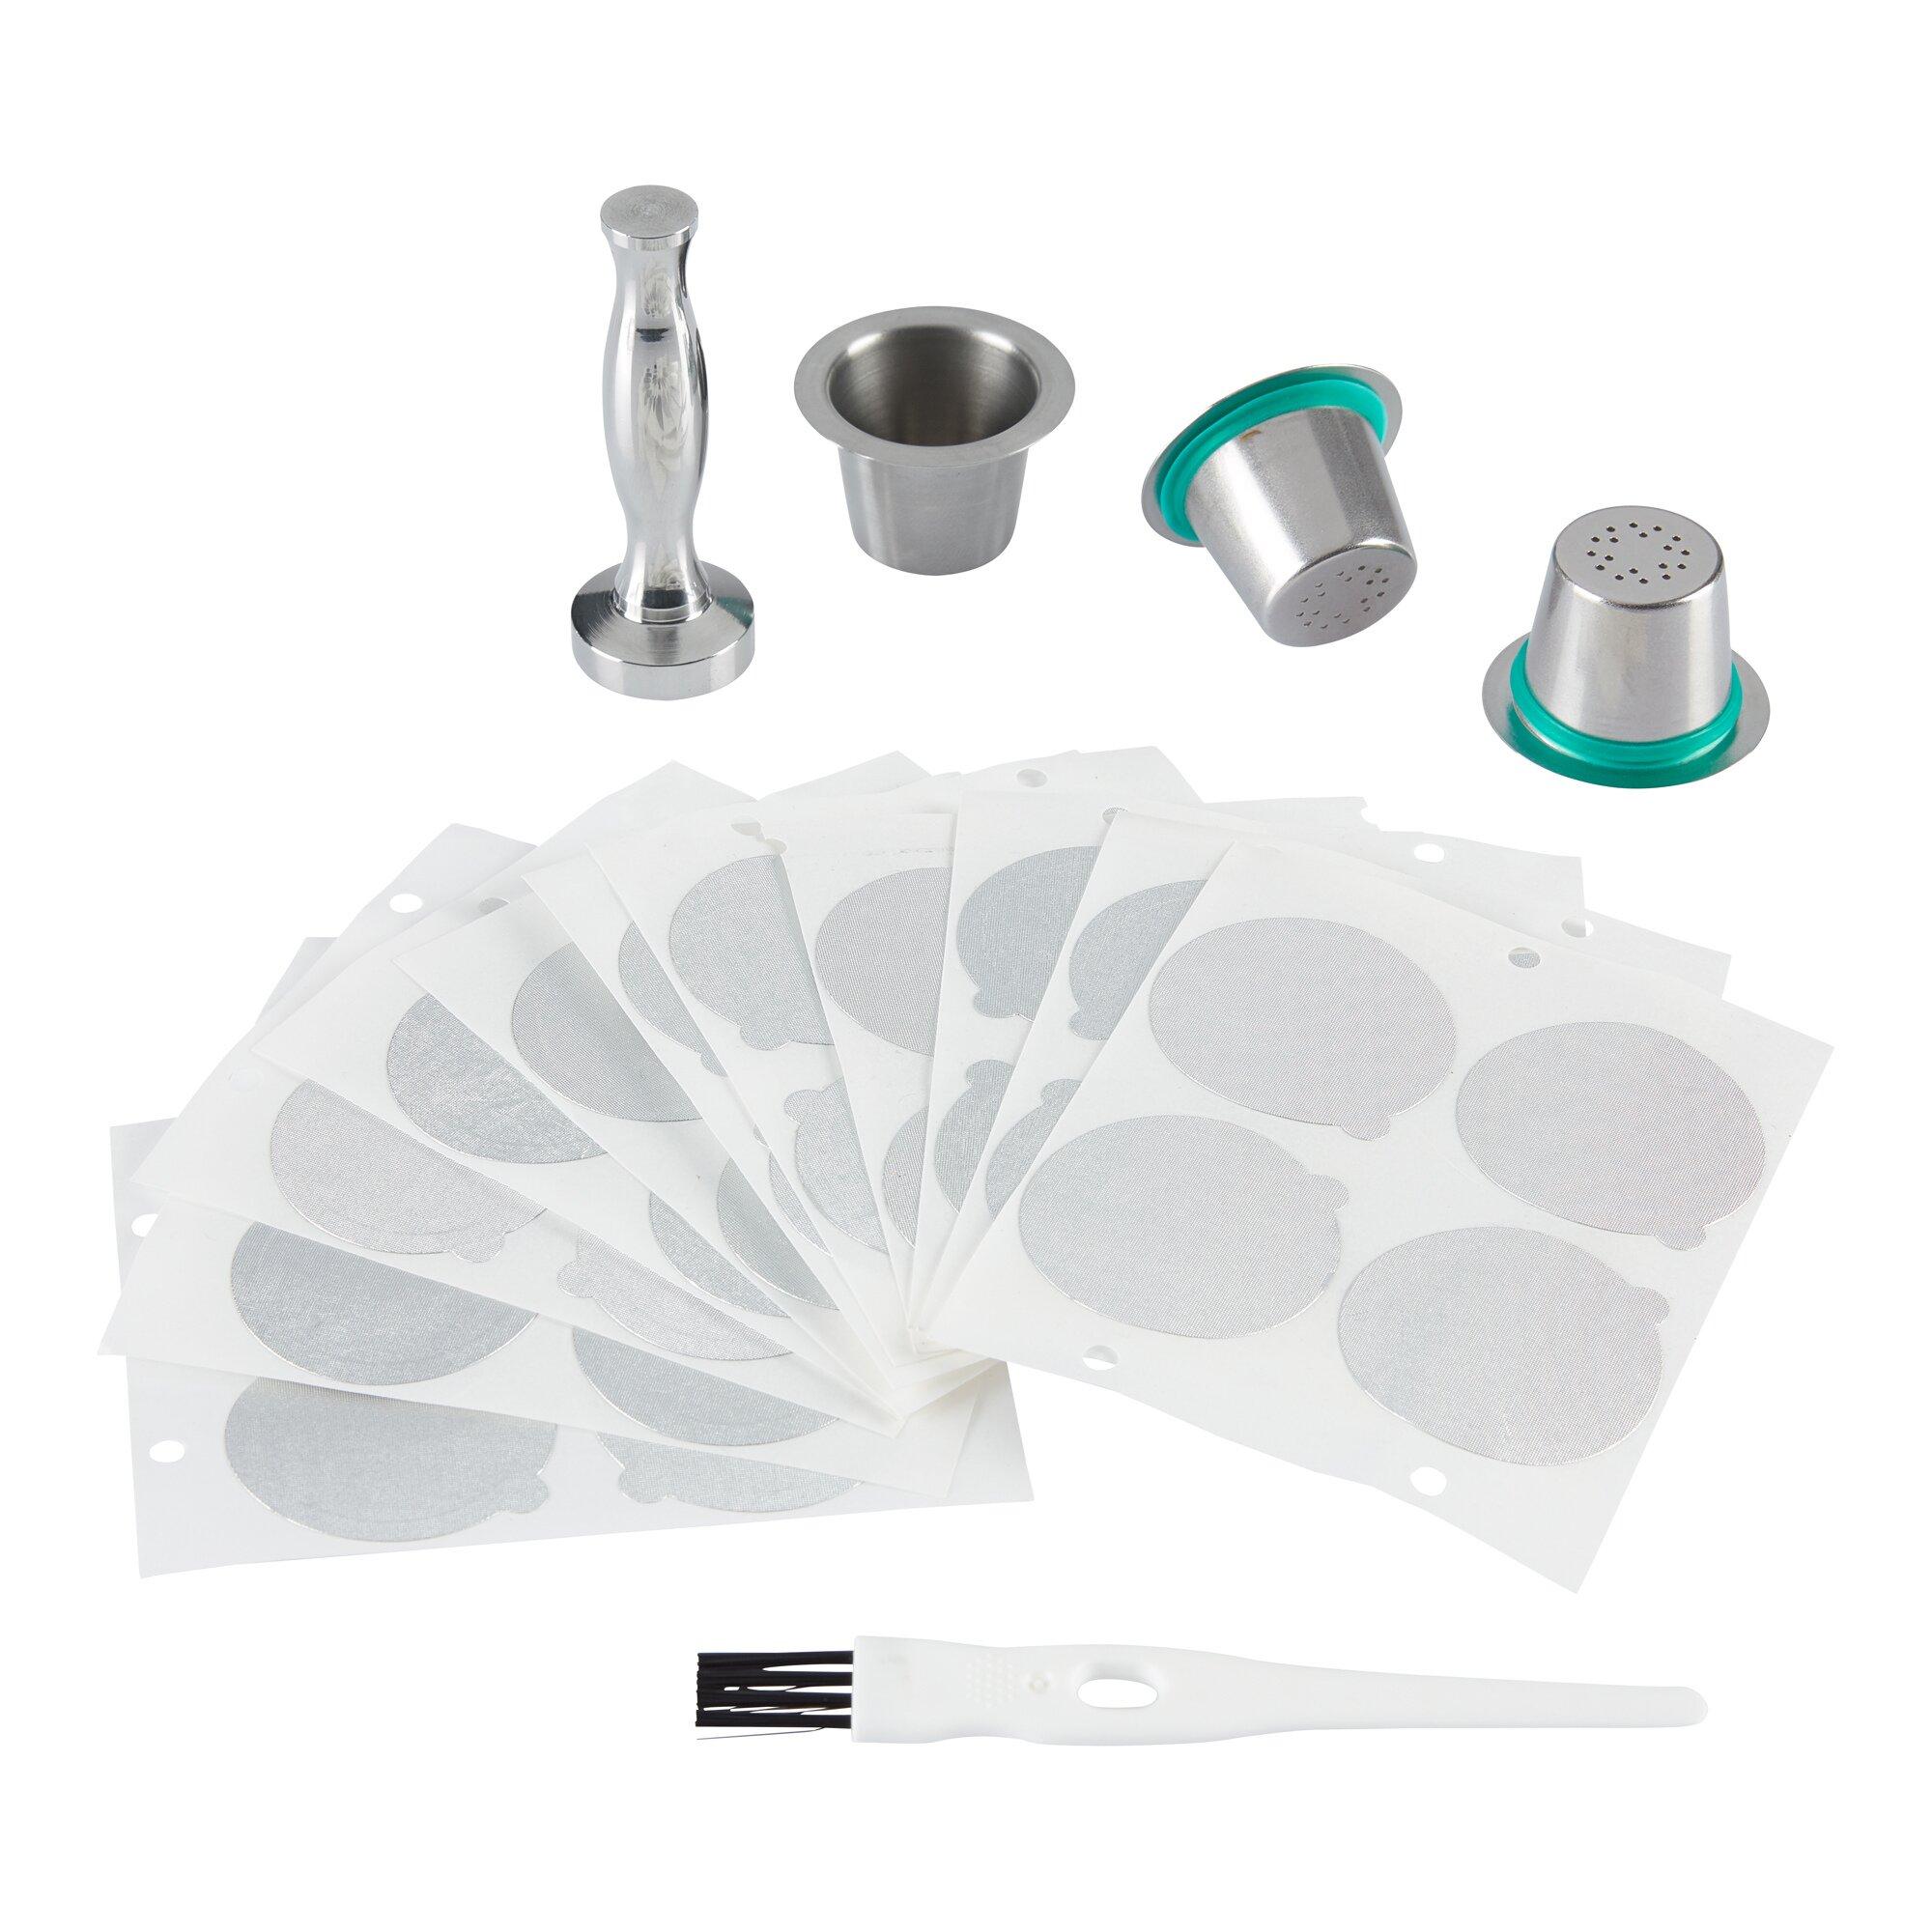 Image of genialo® Starter-Kaffee-Kapsel-Set